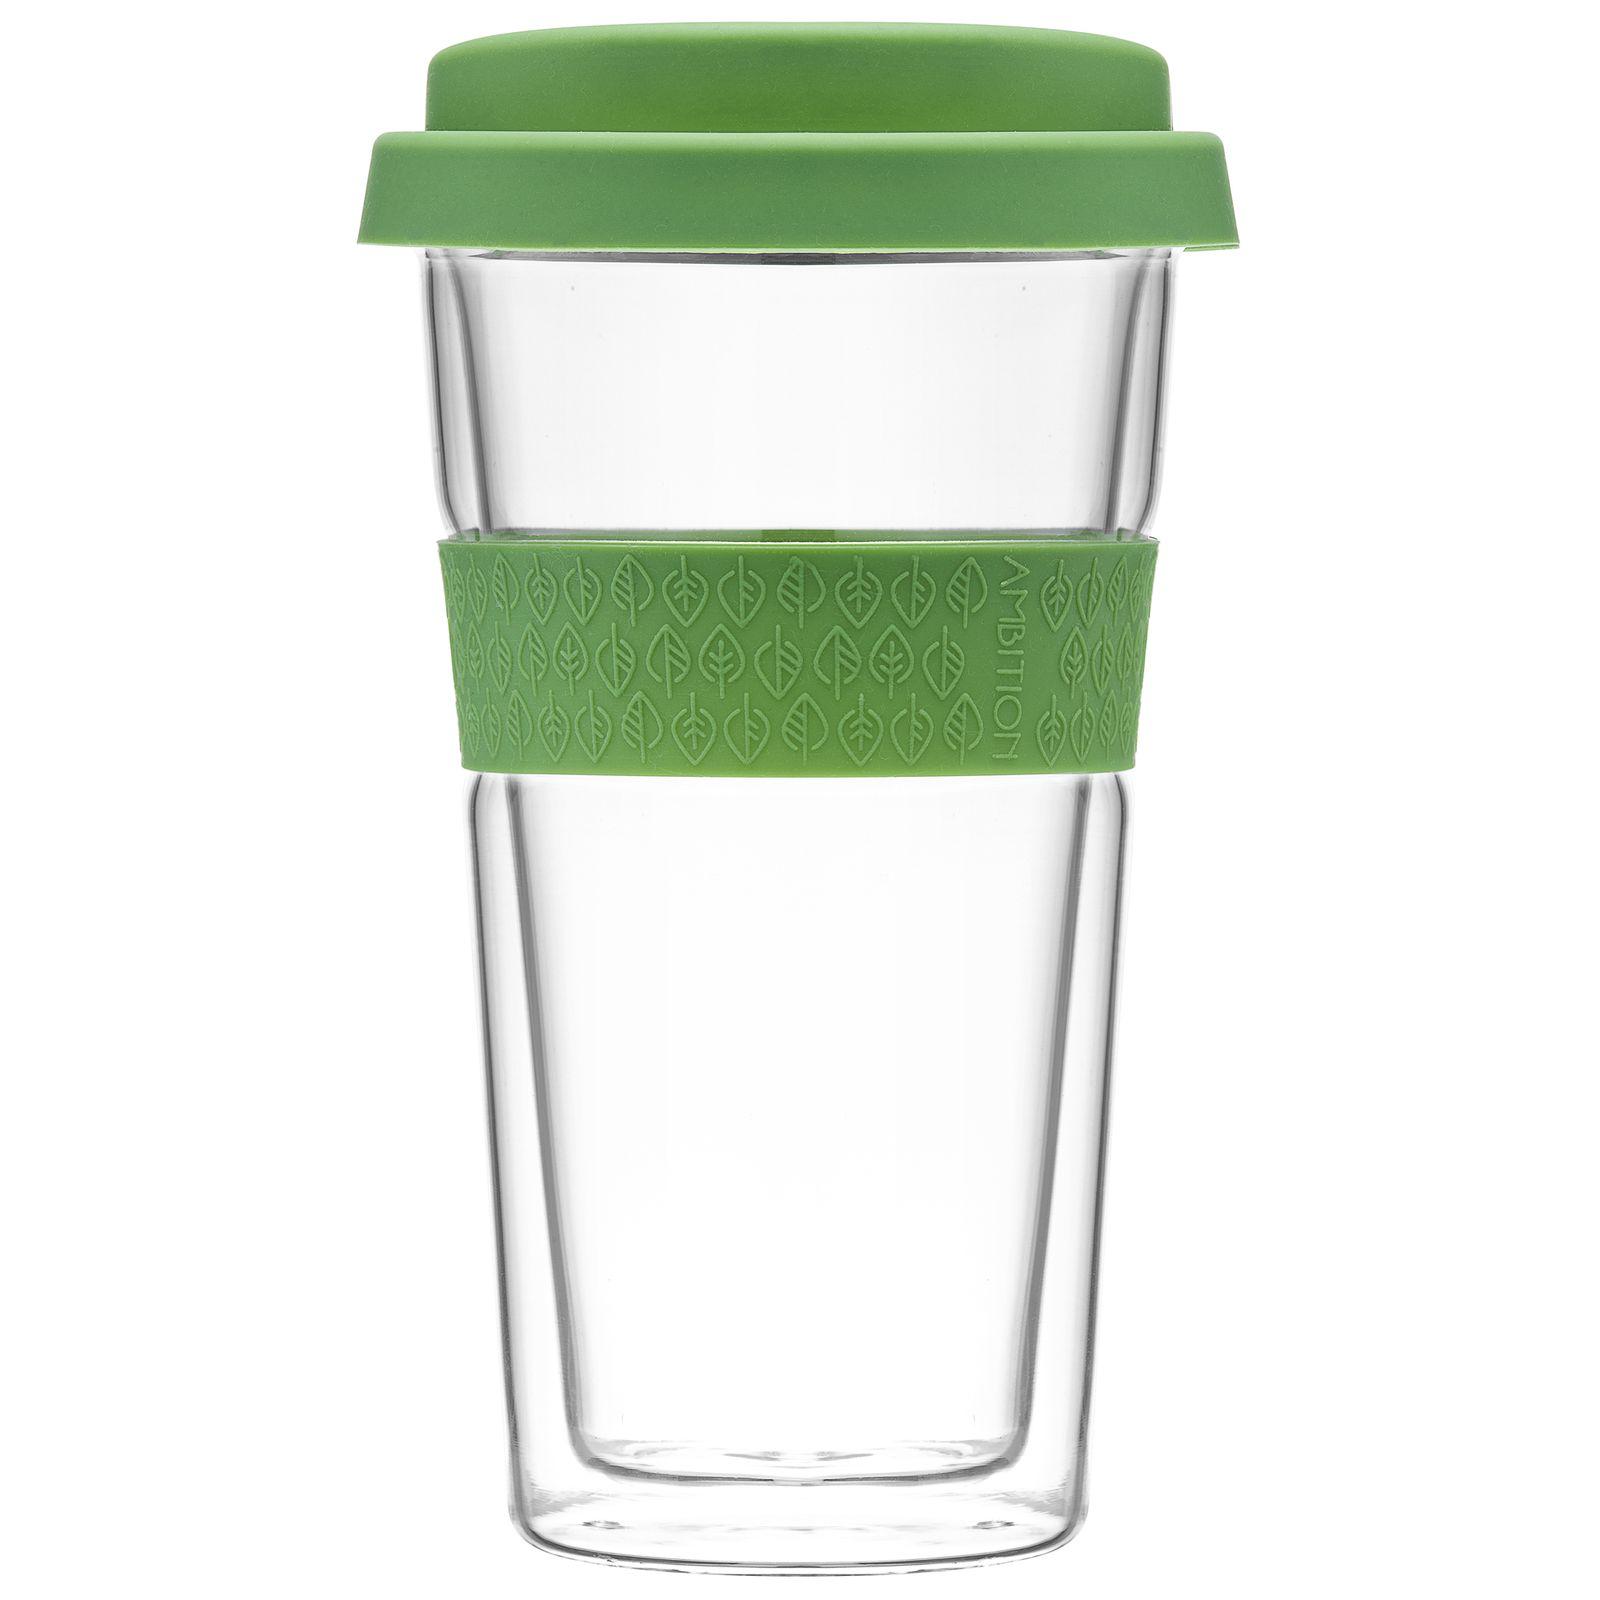 Kubek / szklanka termiczna z opaską Bizet 400 ml Green AMBITION